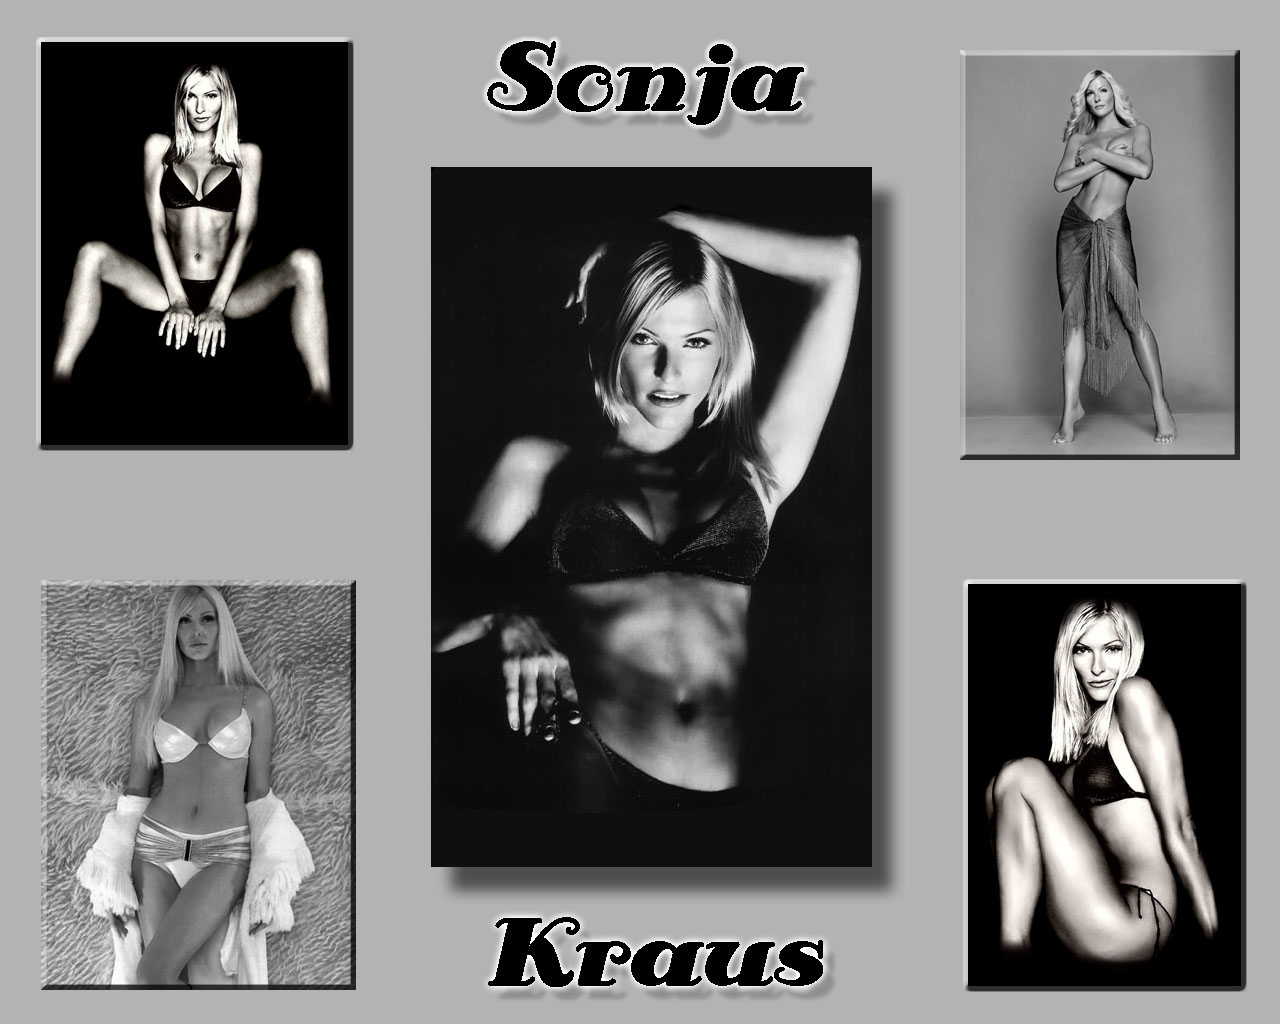 Sonja kraus 1